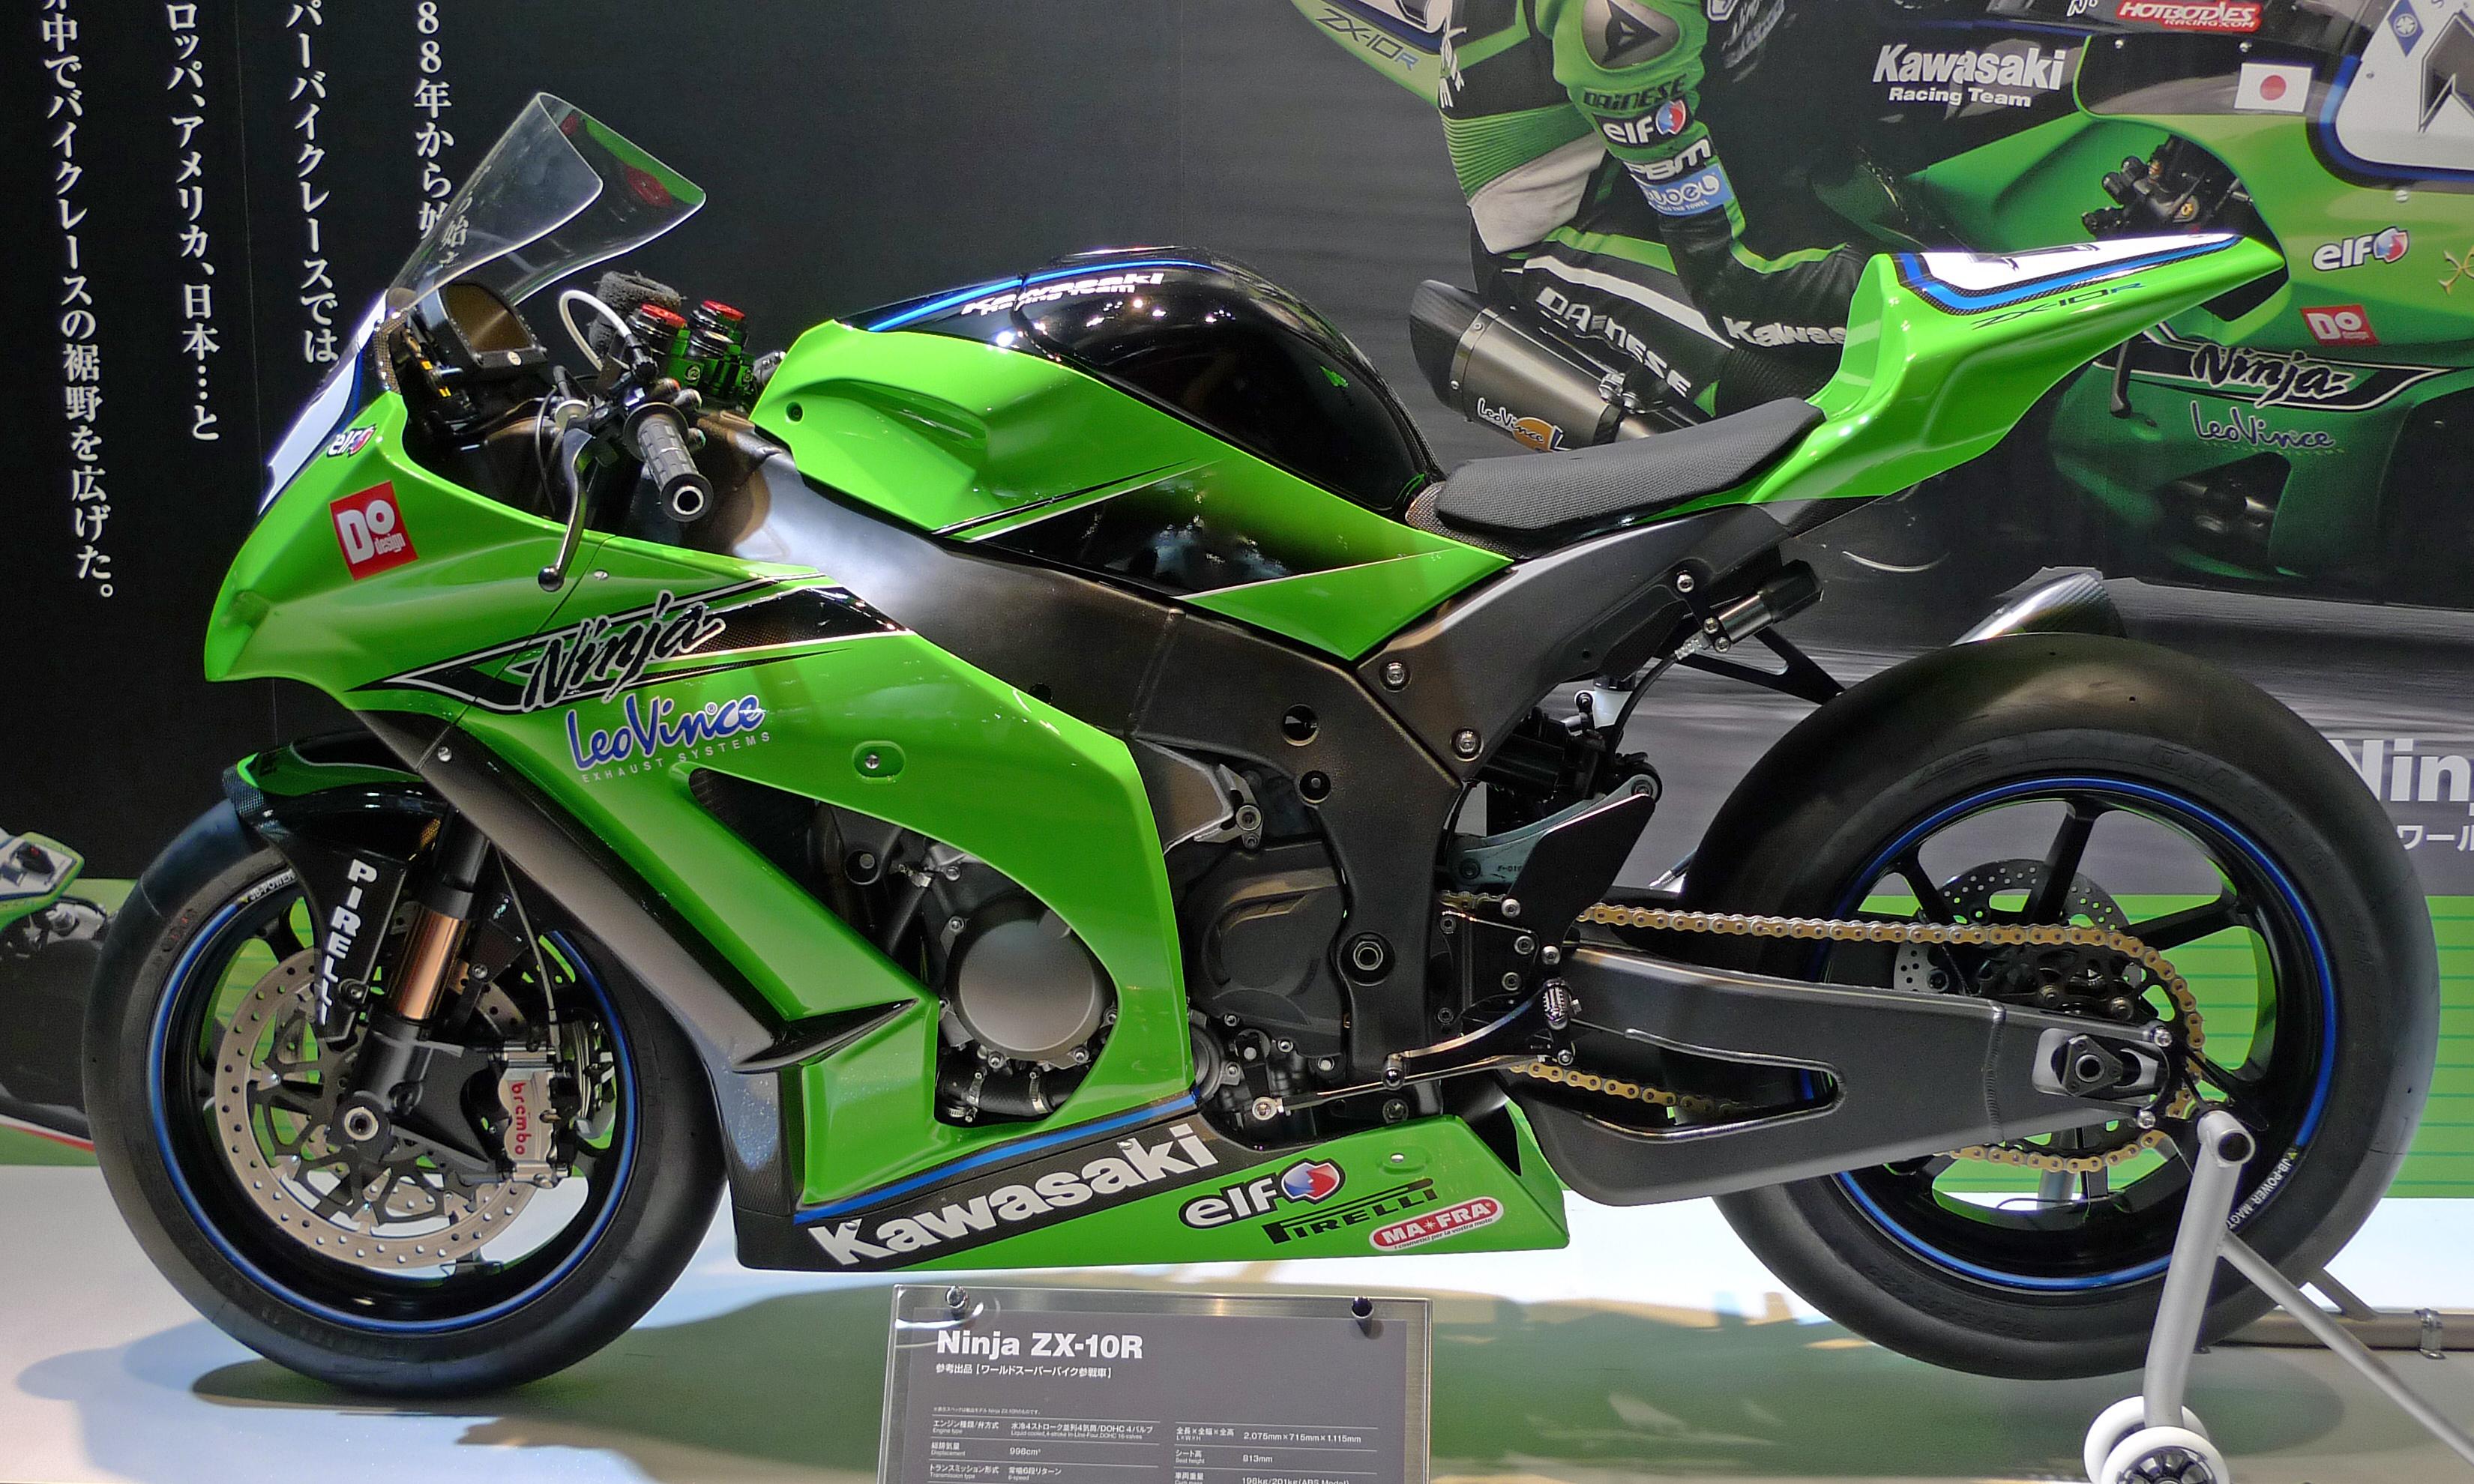 Kawasaki Model